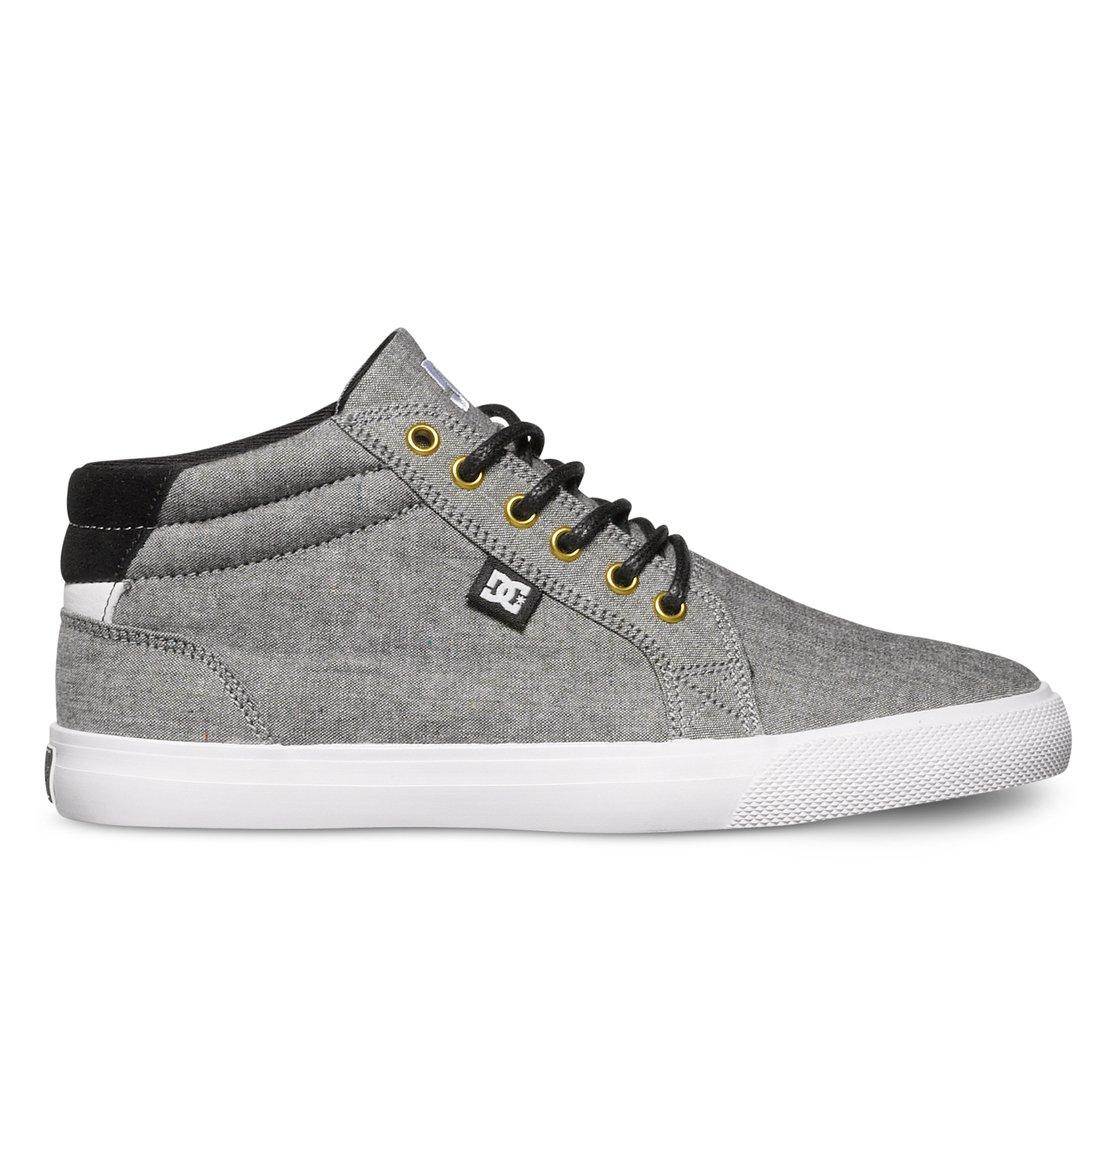 DC Shoes Council SE - Mid-Top Shoes - Chaussures mi-Hautes - Homme XMLeyfXX